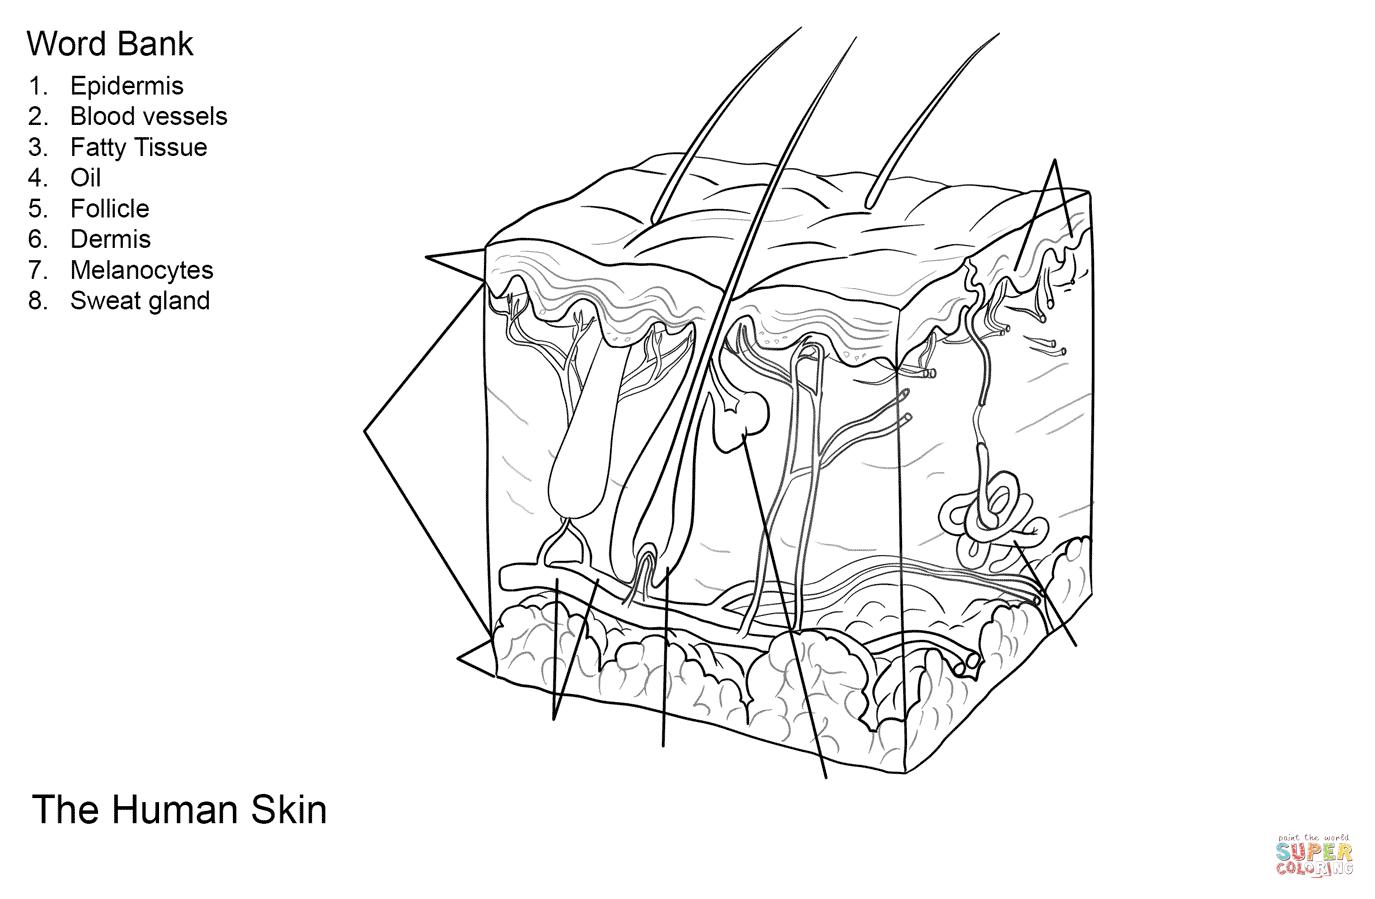 Human Skin Anatomy Worksheet Coloring Page   Free Printable Coloring - Free Printable Anatomy Pictures